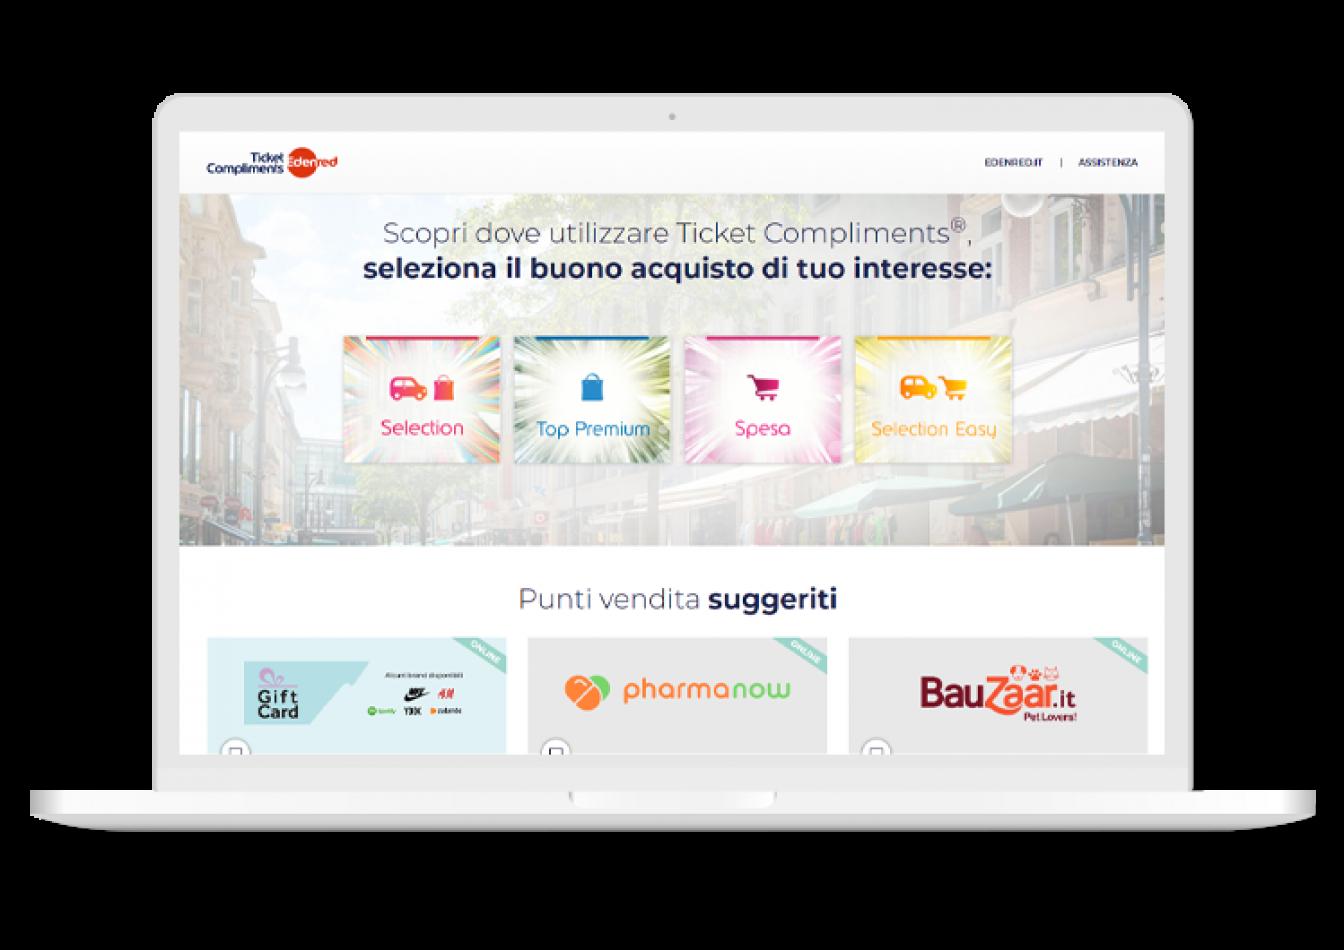 buoni-regalo-ticket-compliments-dovecompro-desktop-202105